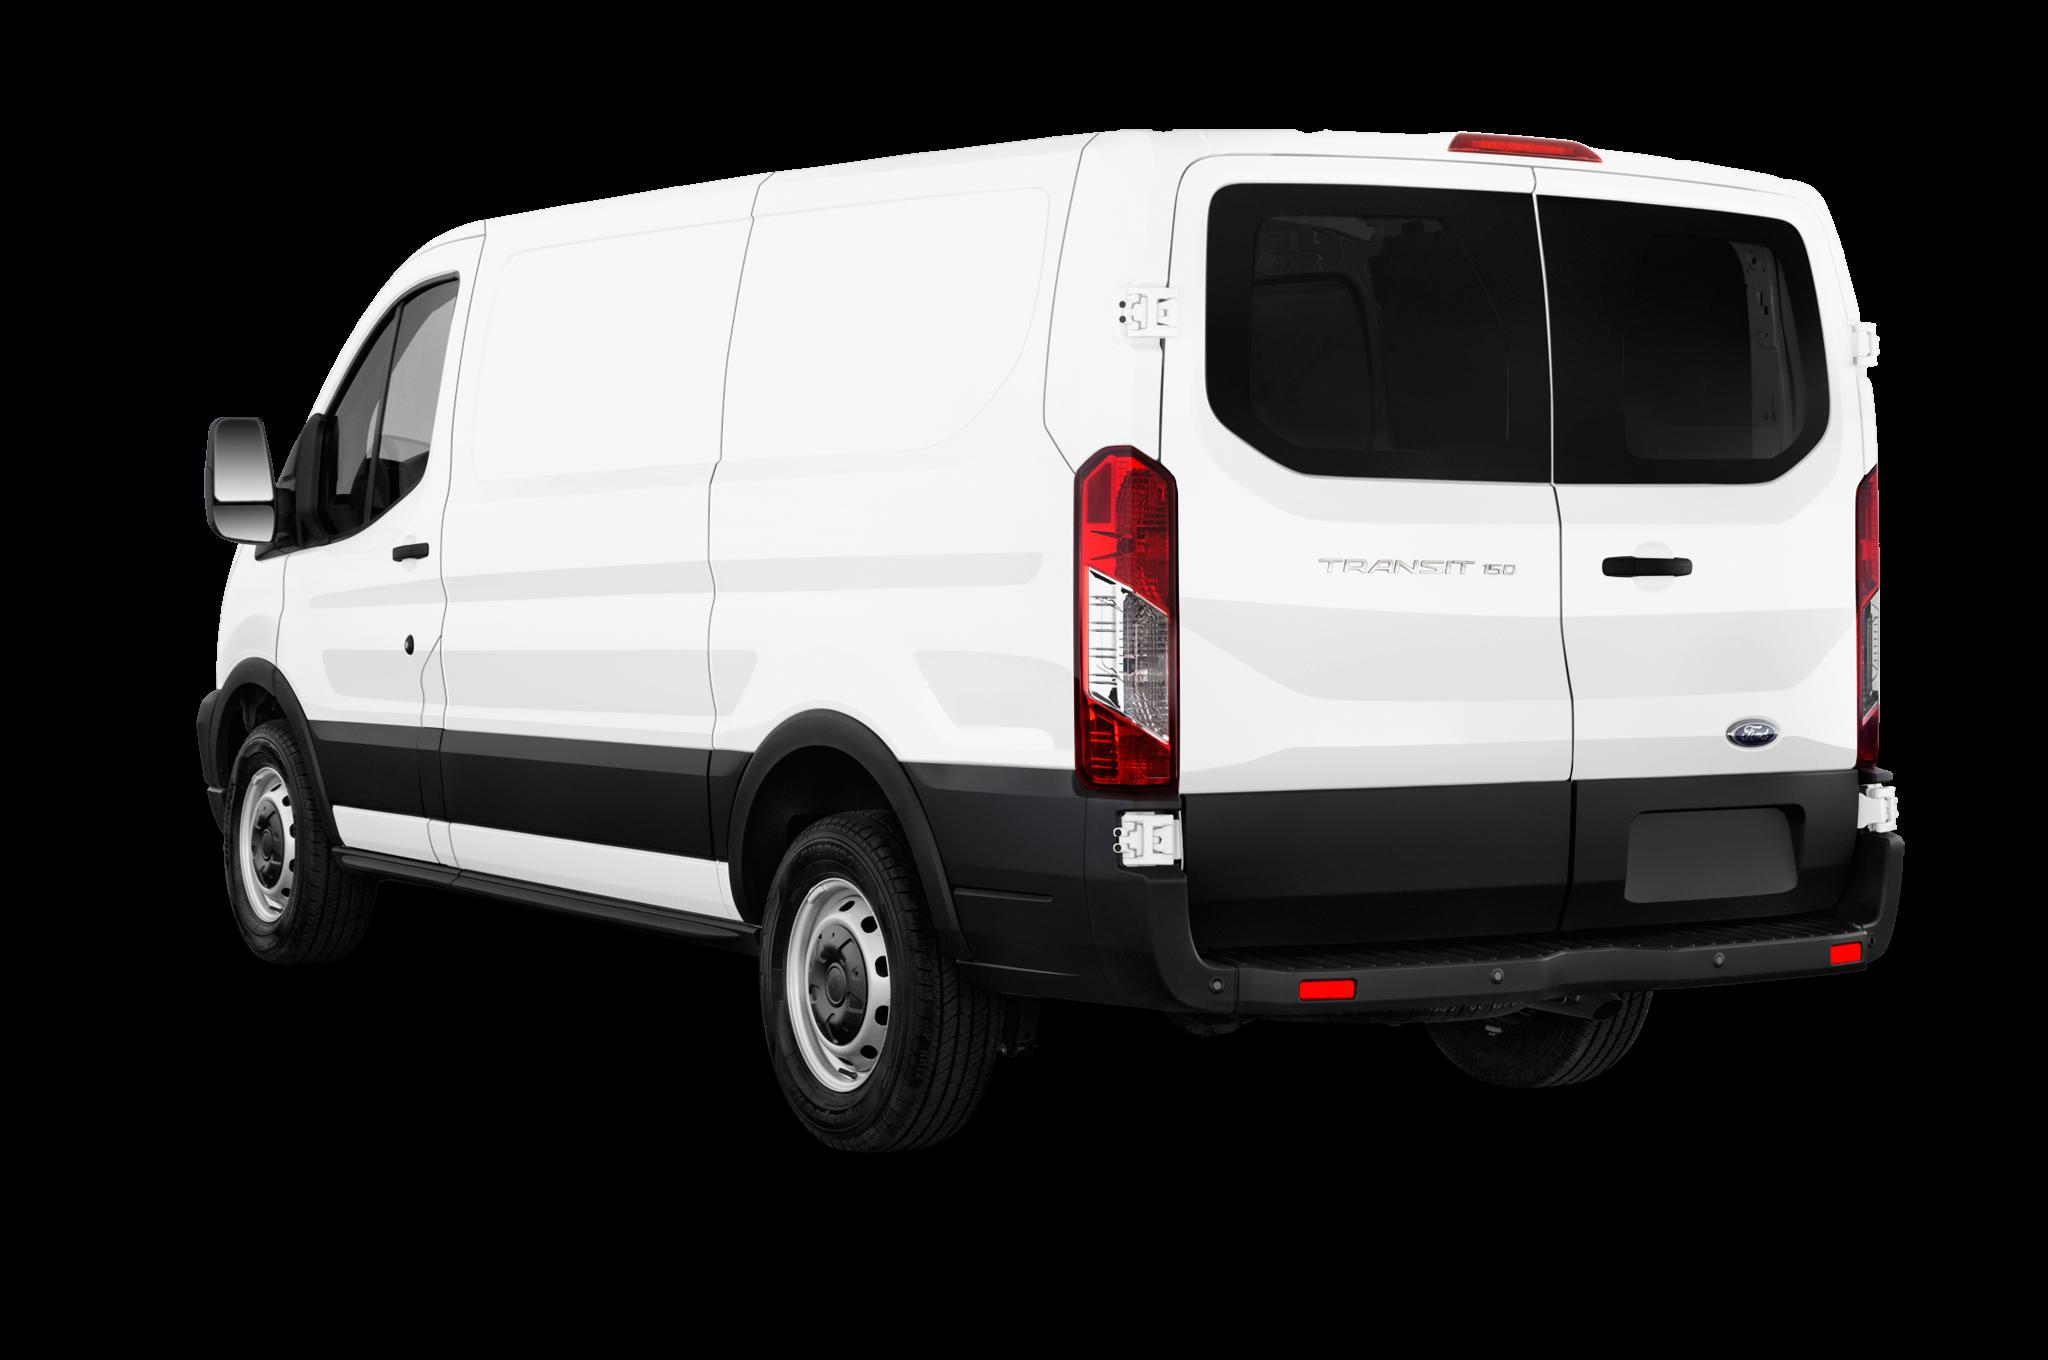 Ford TRANSIT 250 Van High Roof Pass Slide 148 WB 2016